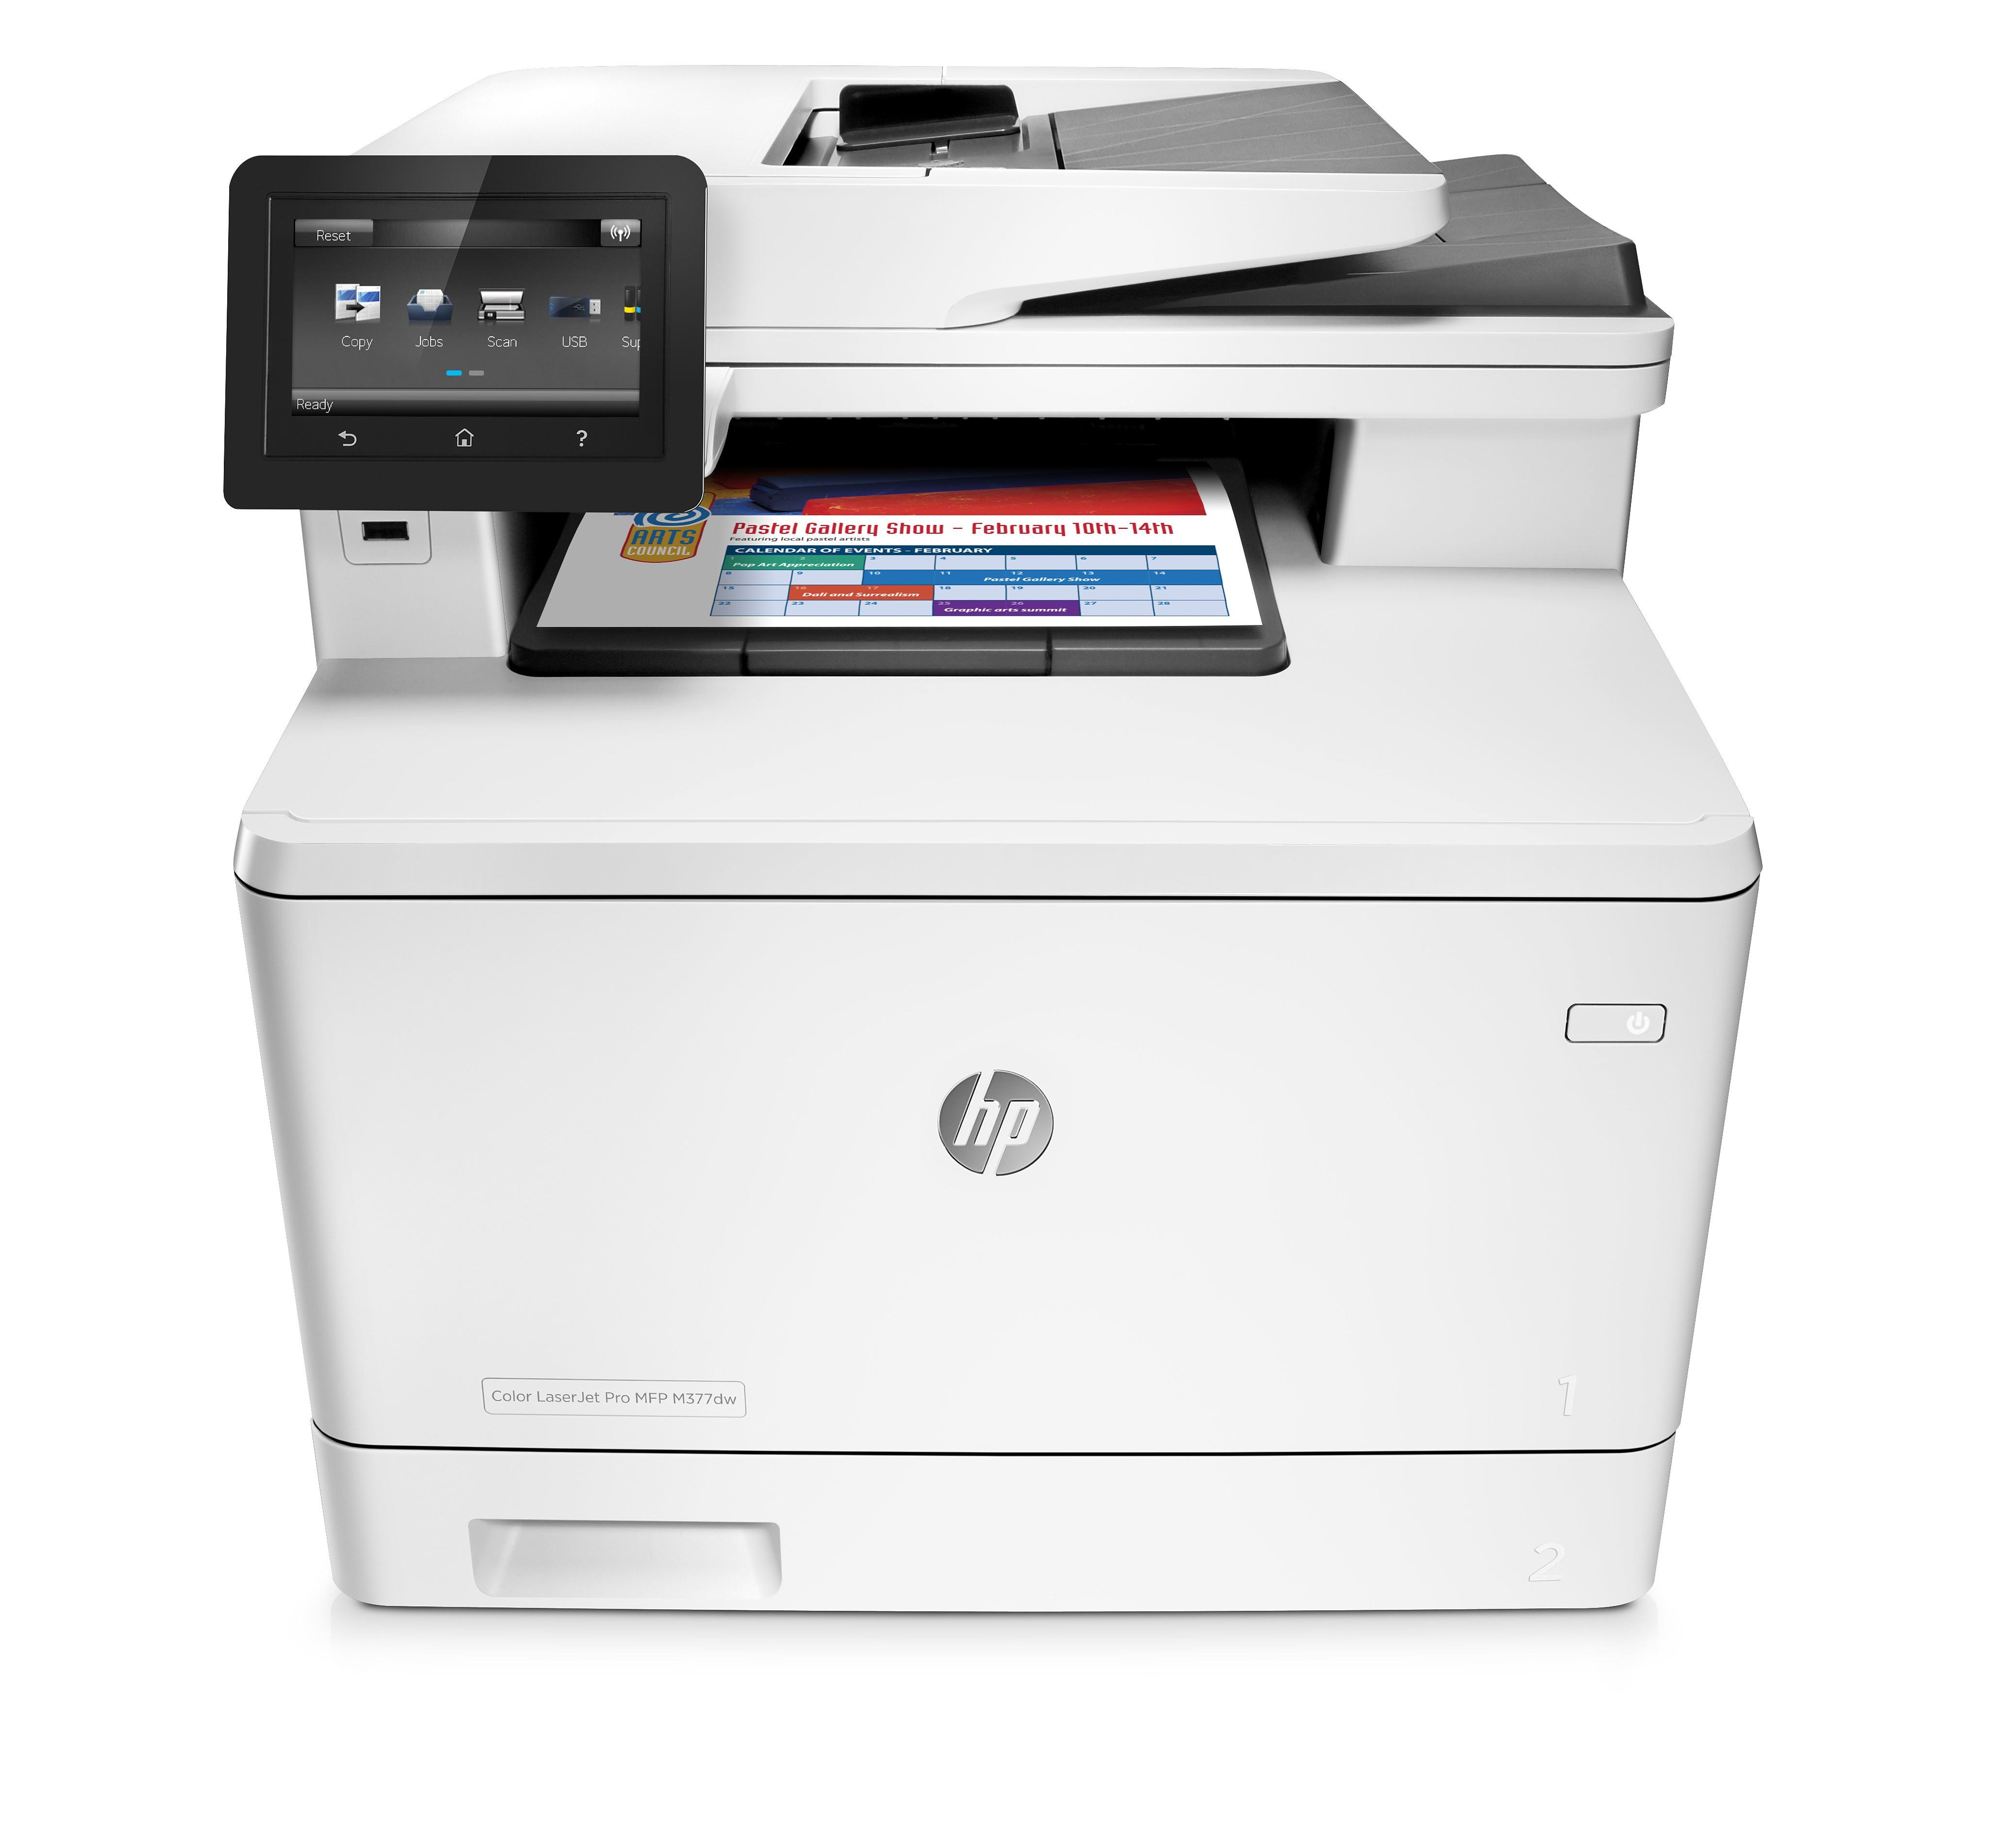 Принтер HP Color LaserJet Pro MFP M377dw